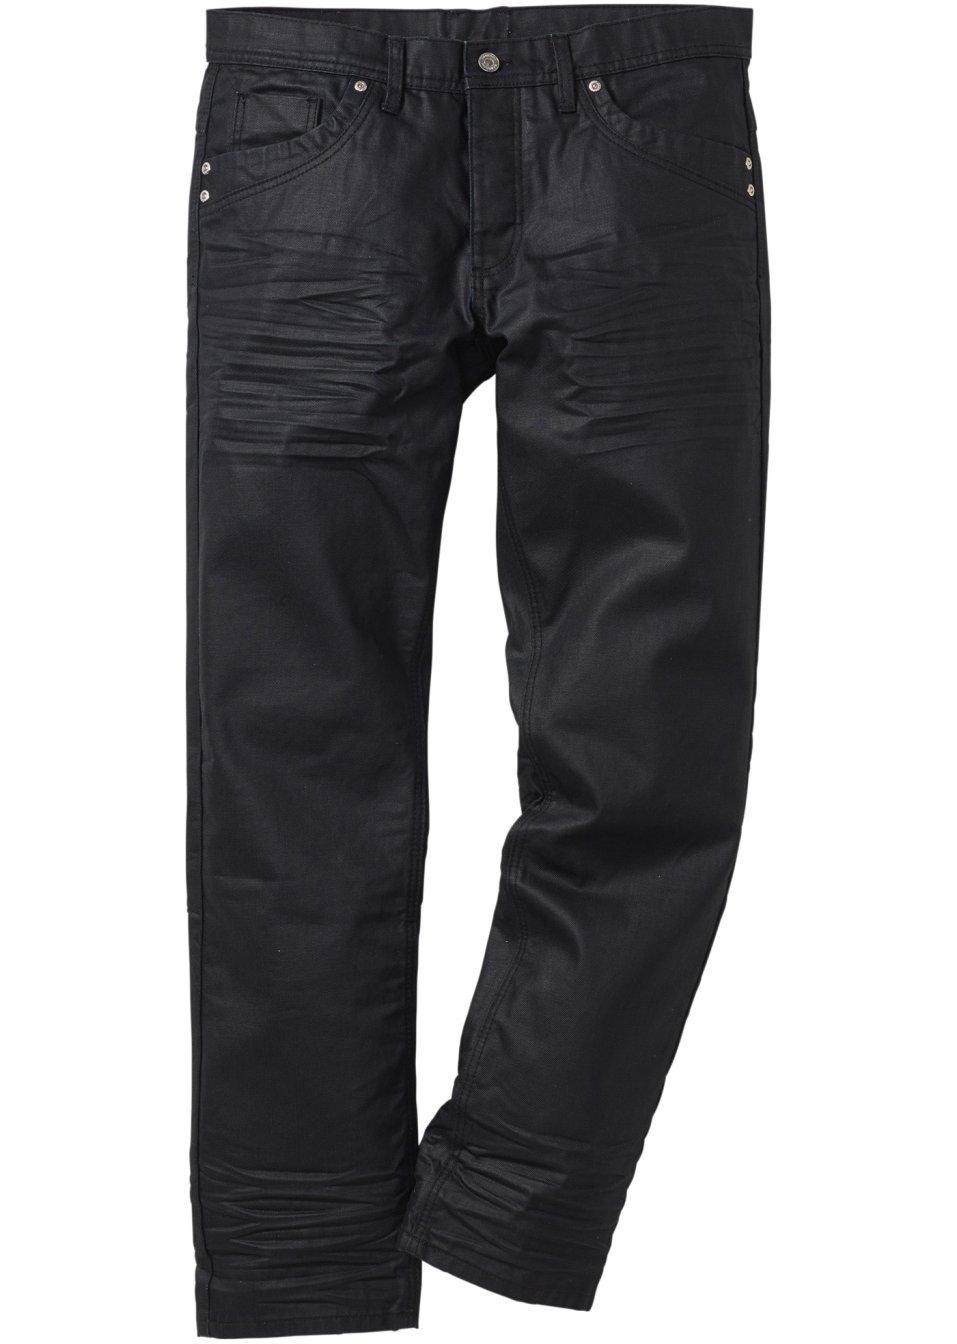 jeans straight nero uomo rainbow. Black Bedroom Furniture Sets. Home Design Ideas